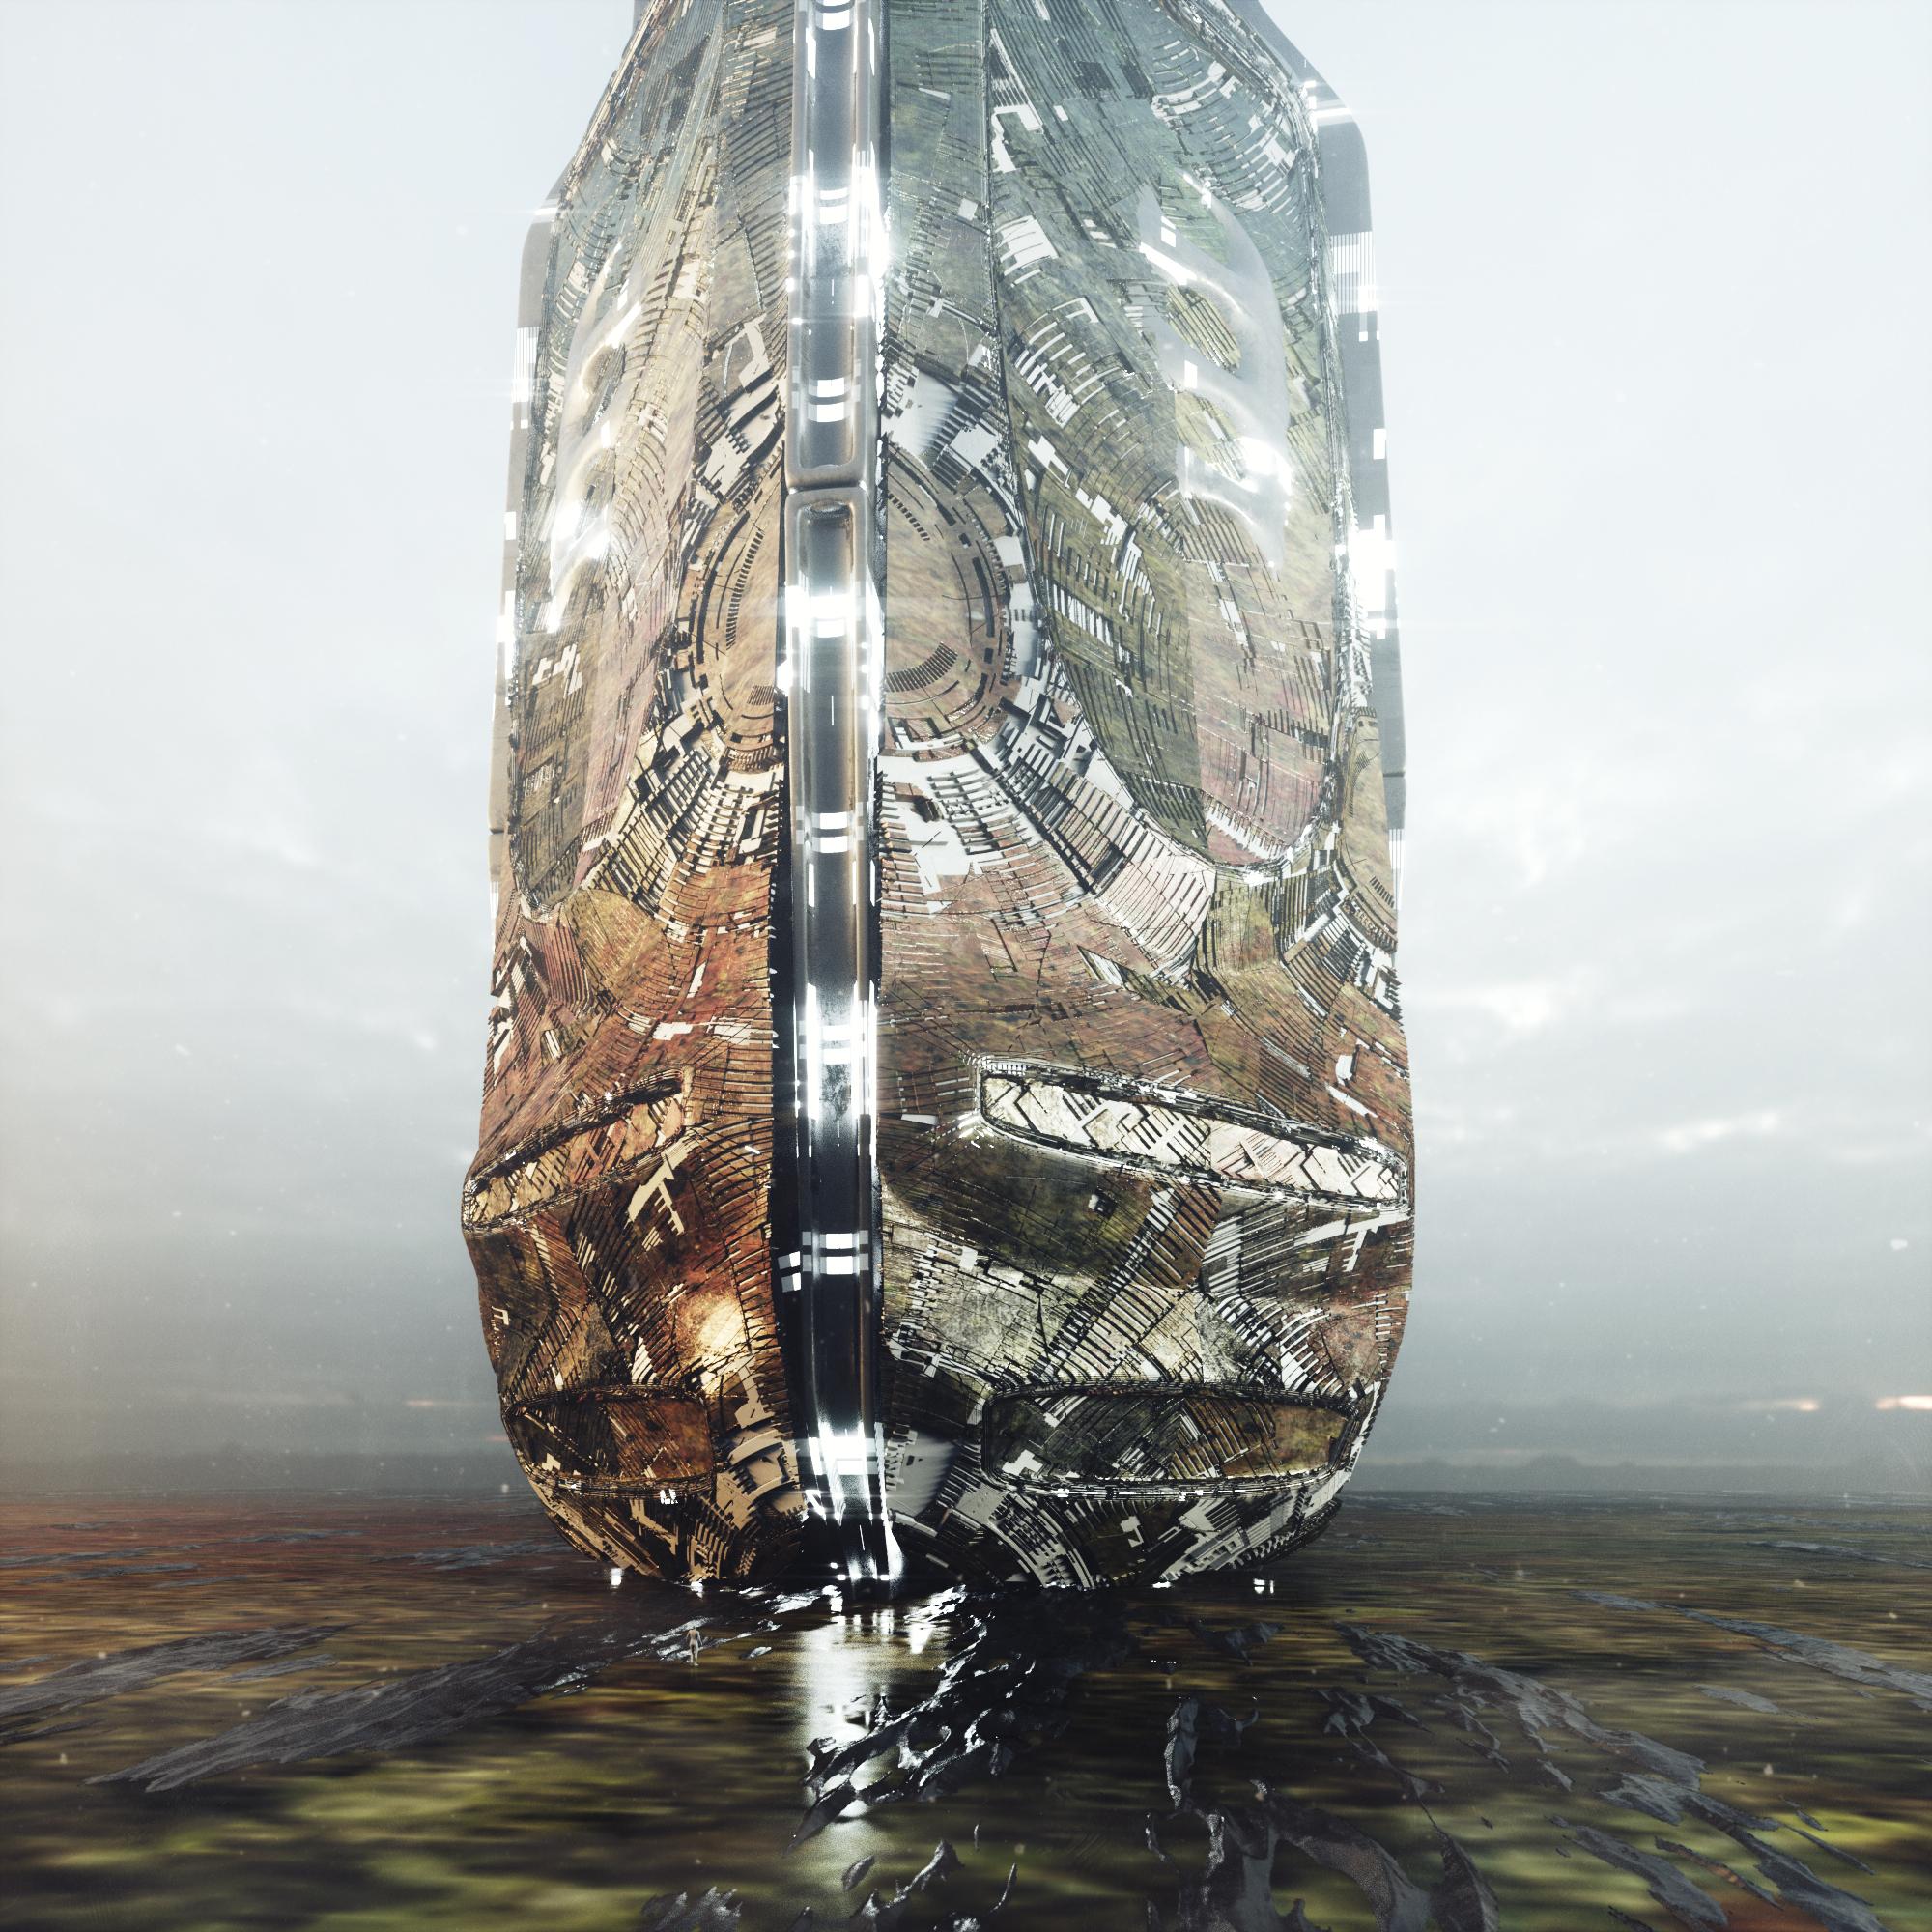 20180728_Tower_0009.jpg